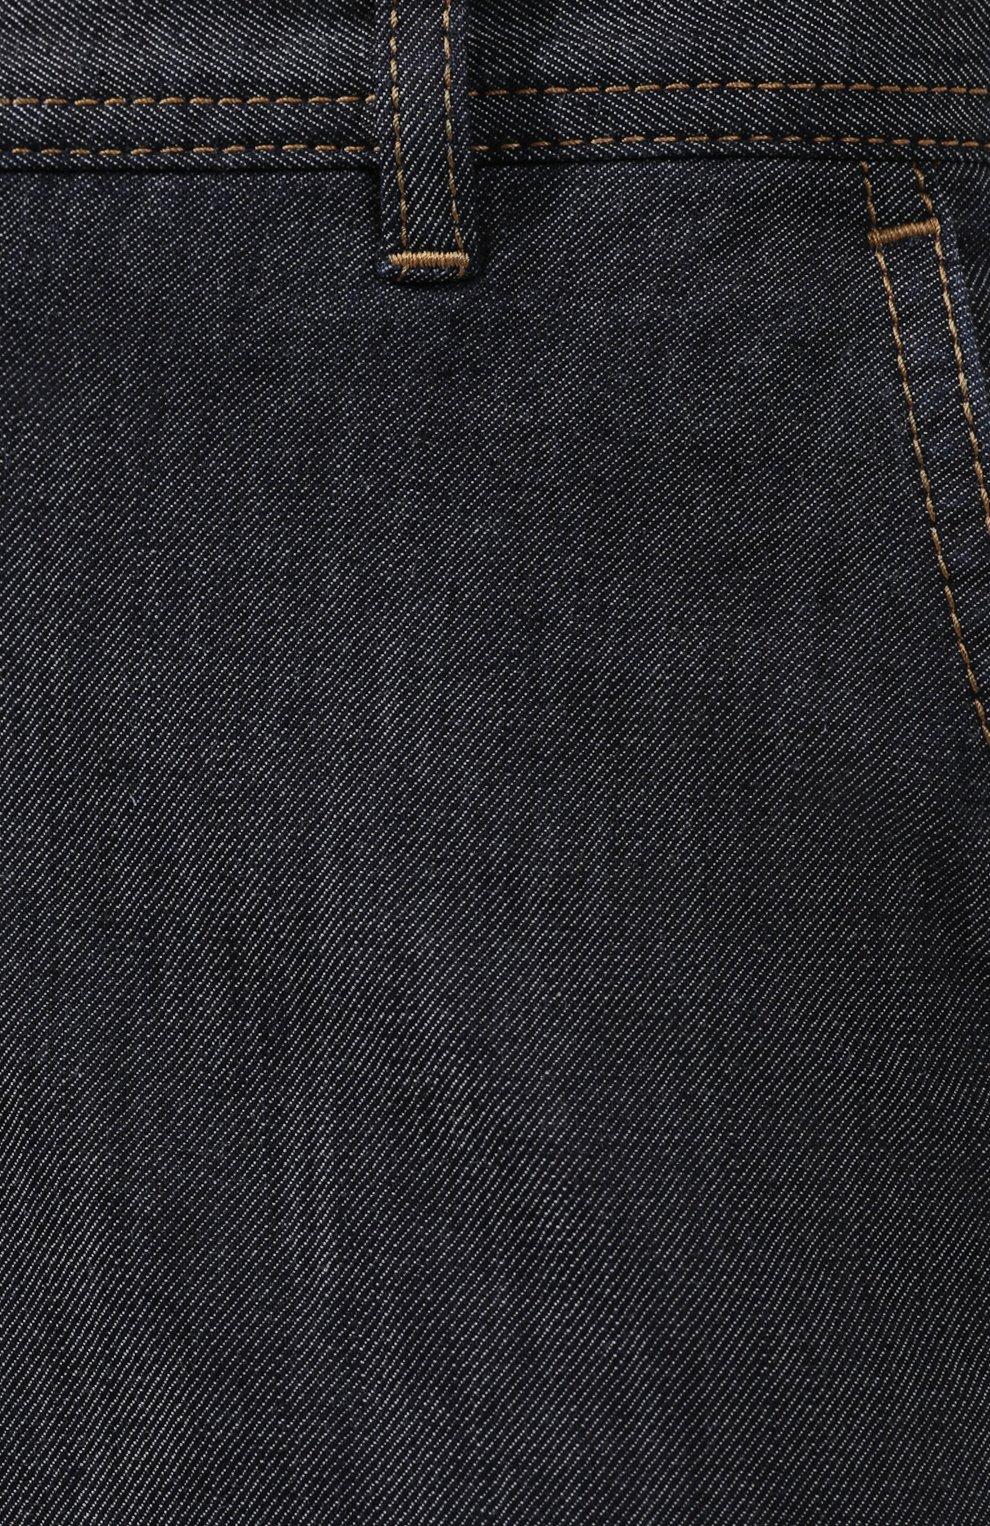 Мужские джинсы BRIONI темно-серого цвета, арт. SPL50M/P9D17/SUNSET   Фото 5